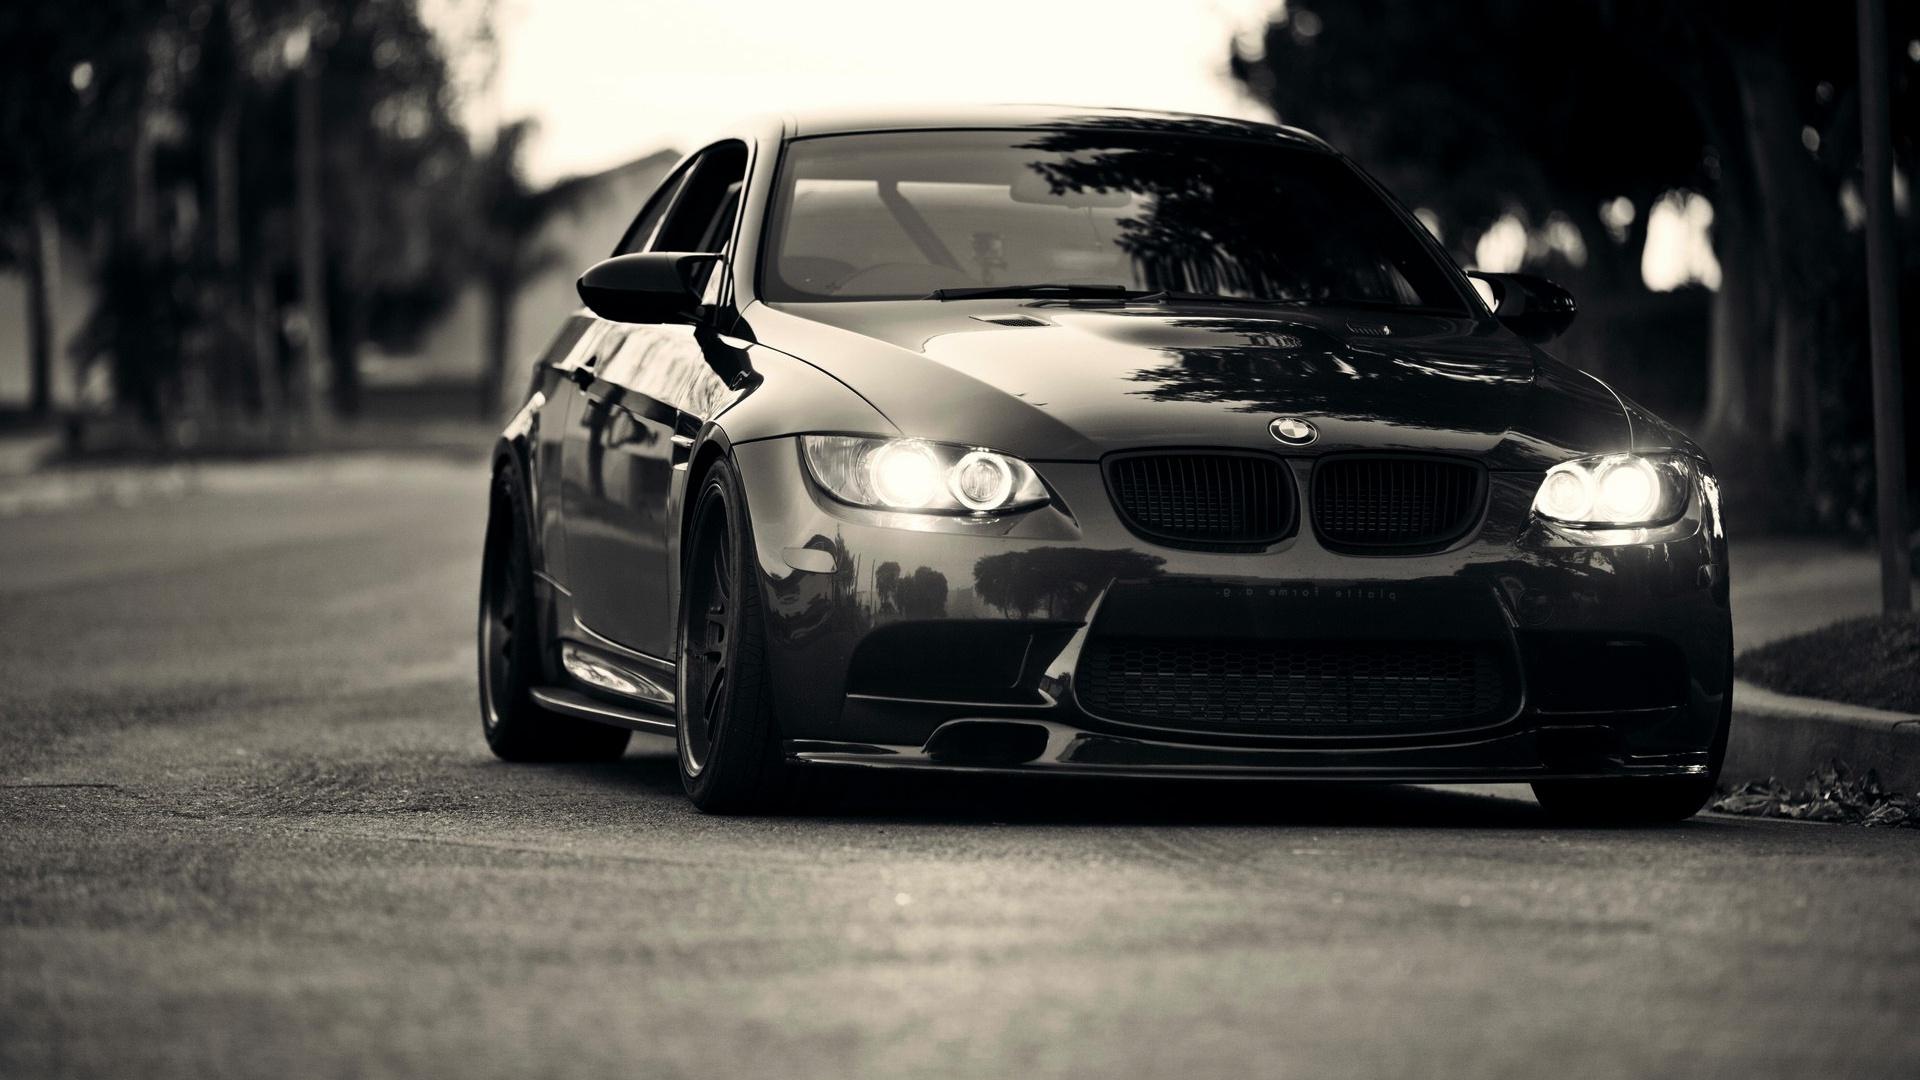 Black BMW Front View